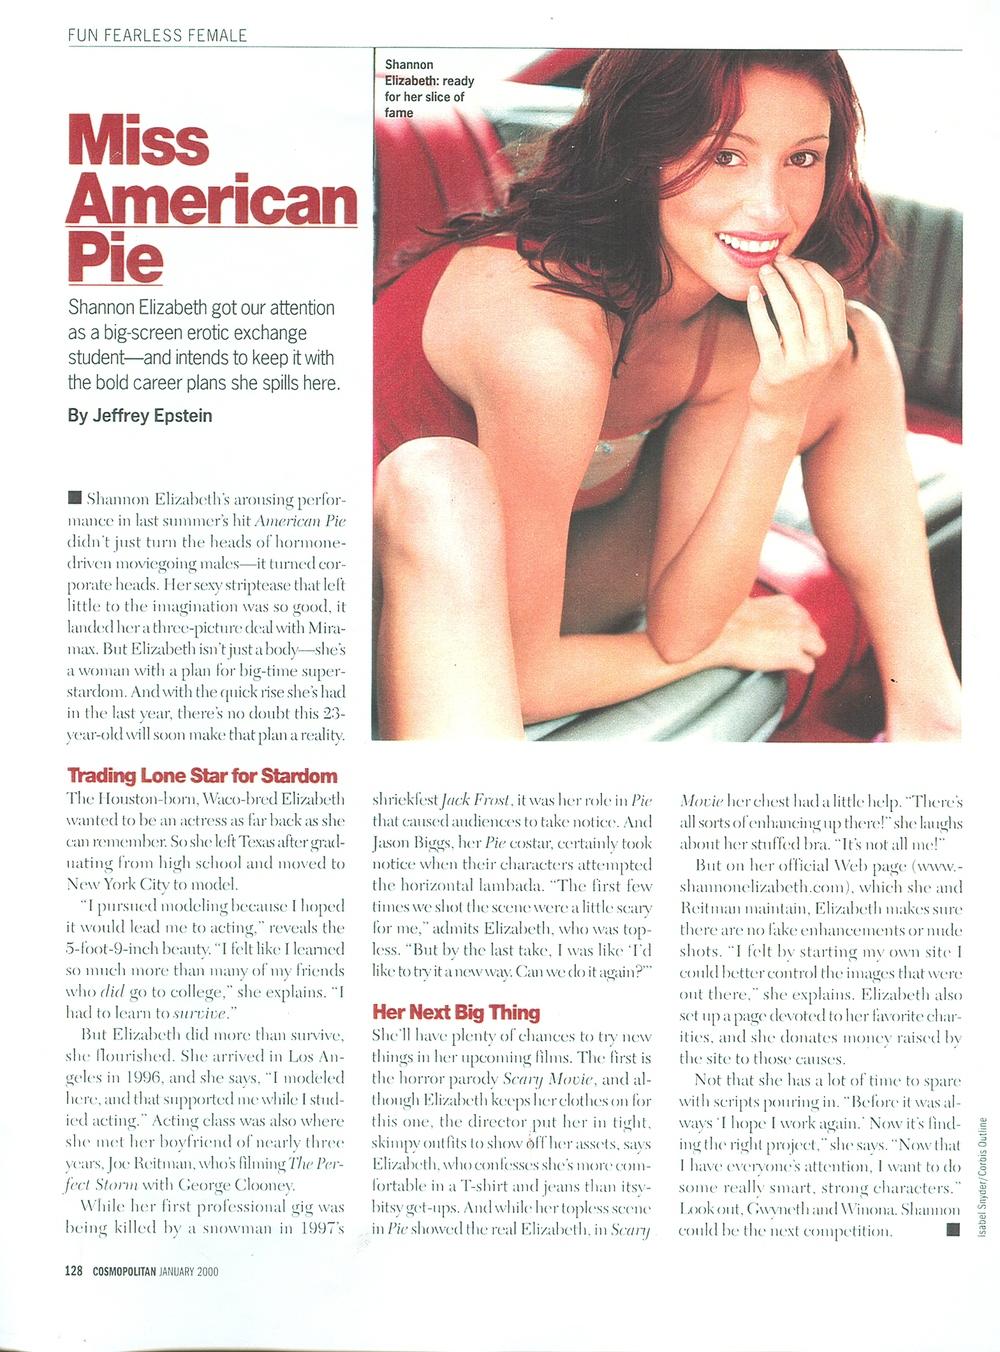 SE_Cosmpolitan_January 2000.jpg